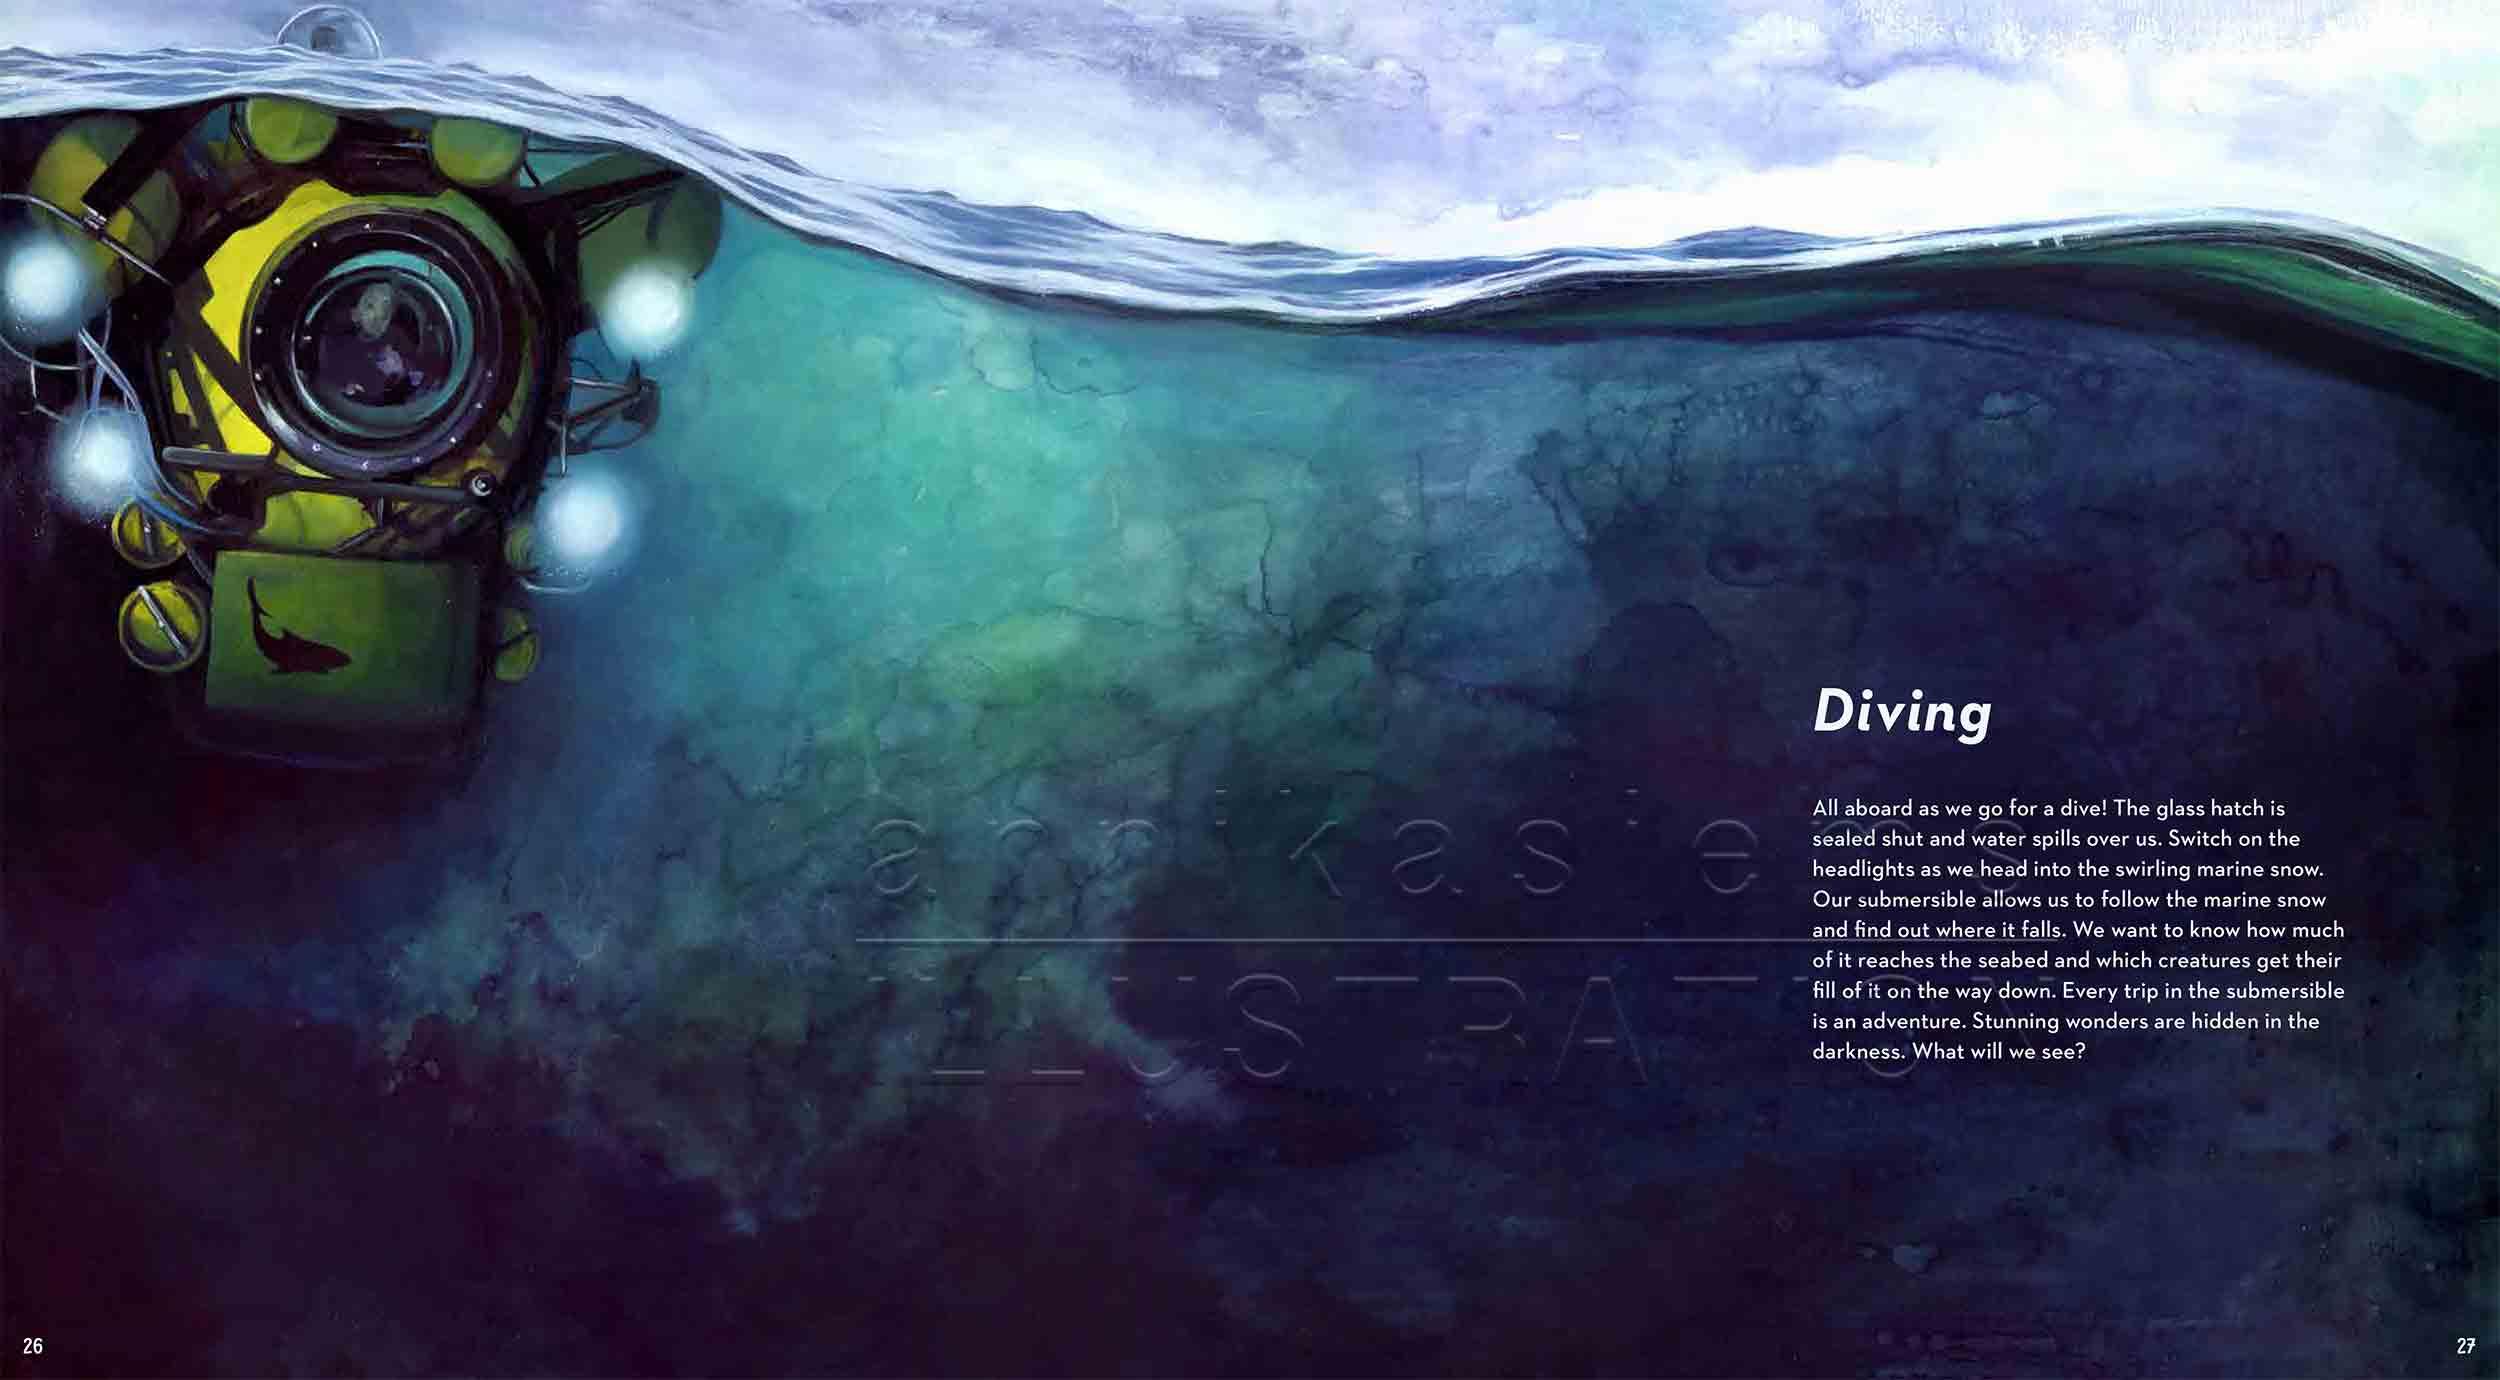 26-27deep-sea-Englisch-submersible-©annikasiems-plankton_deepsea-zooplankton.jpg